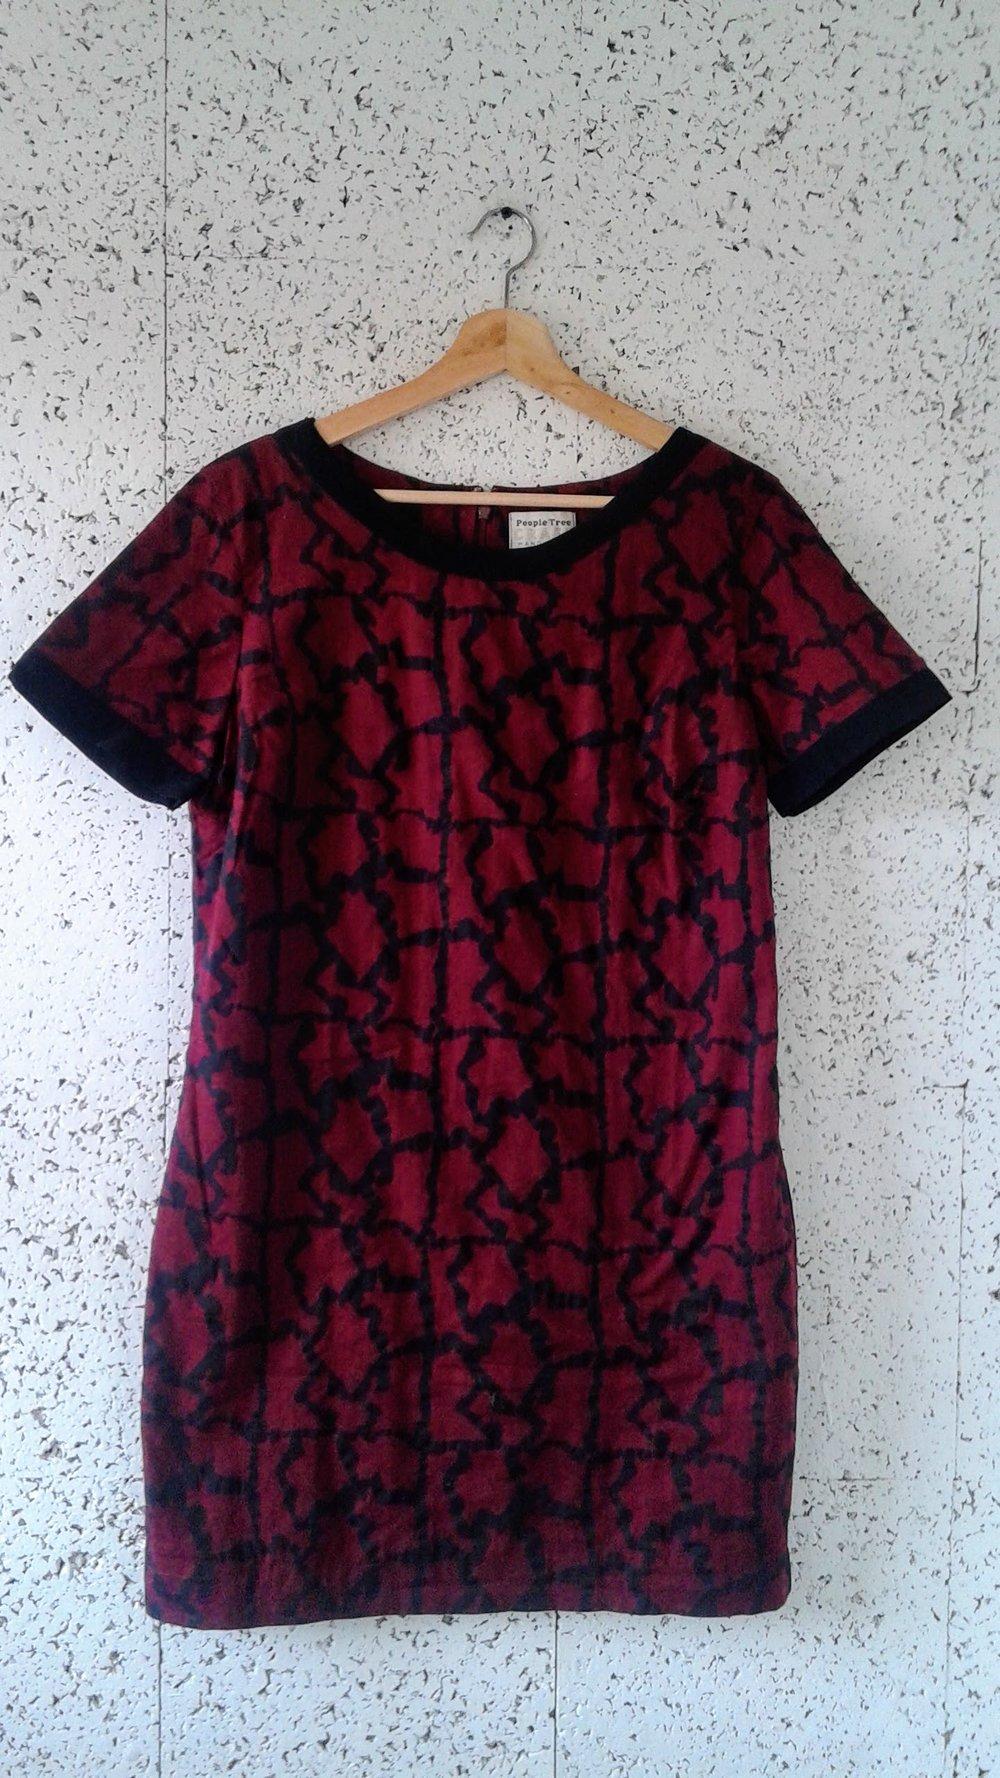 People Tree dress; Size L, $36